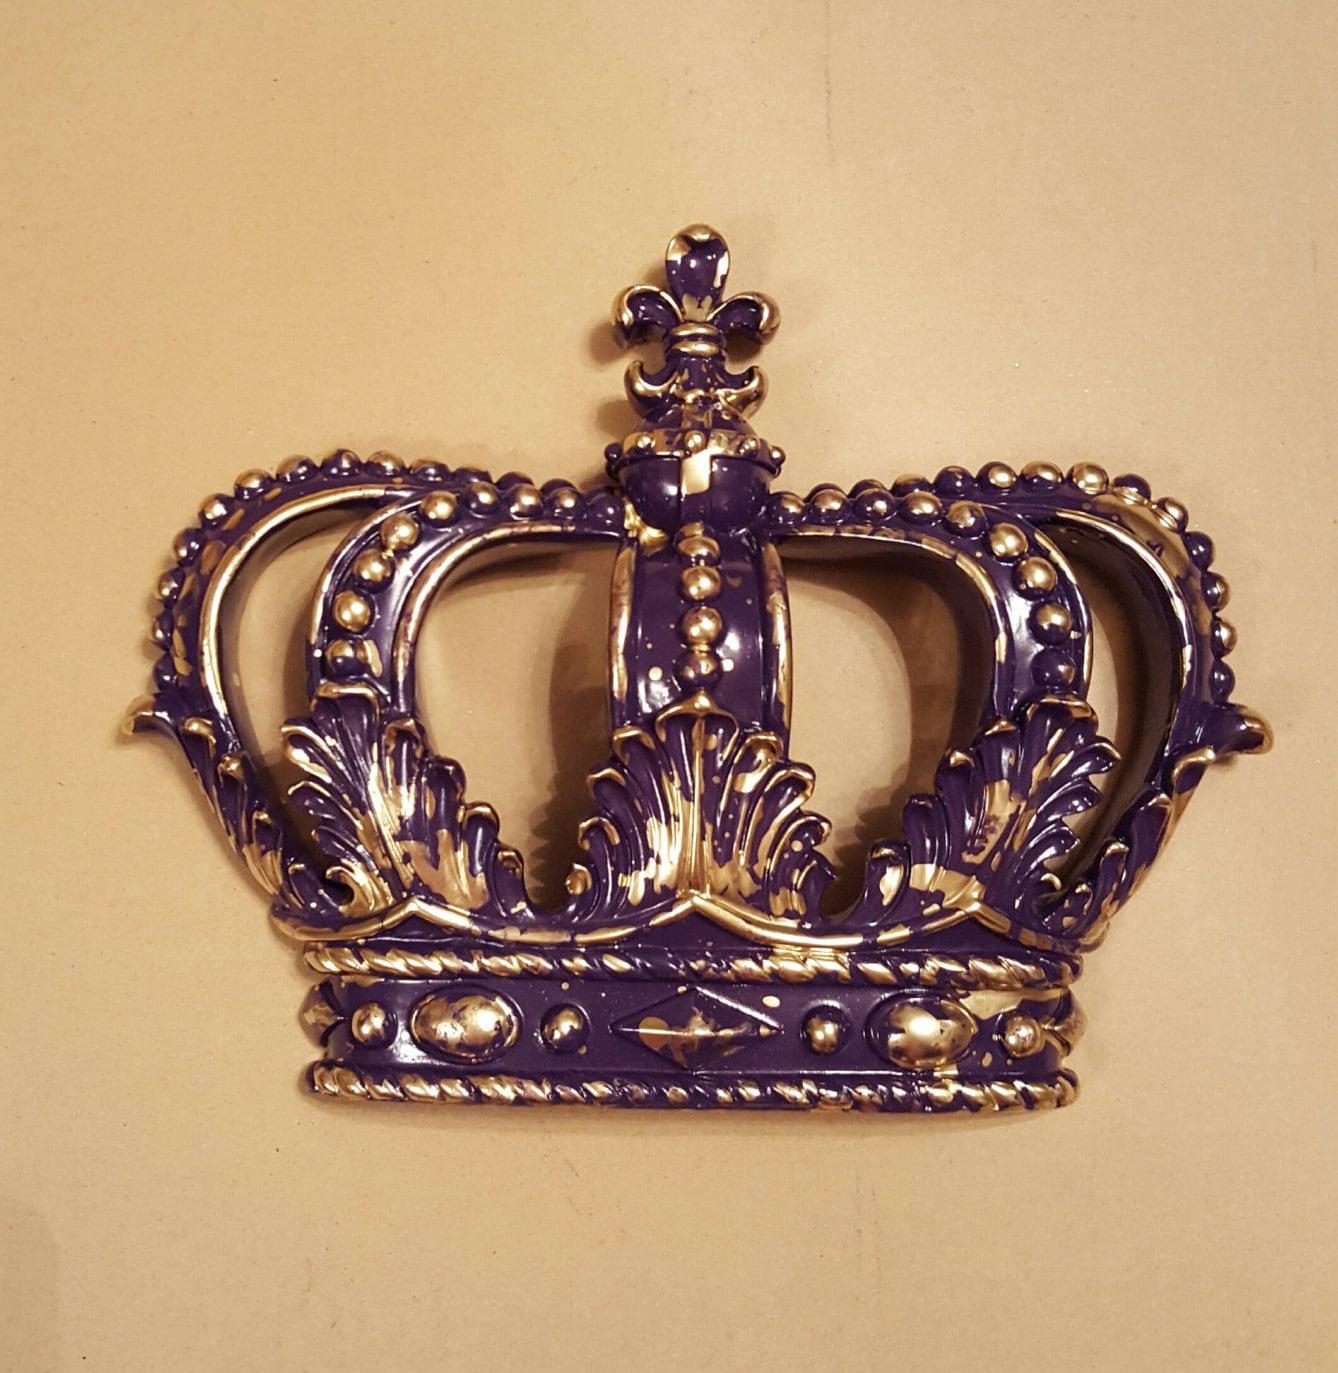 Bed Crown Canopy Crib Crown Nursery Design Wall Decor: Purple Gold Crown Wall Decor Nursery Decor Crib Crown